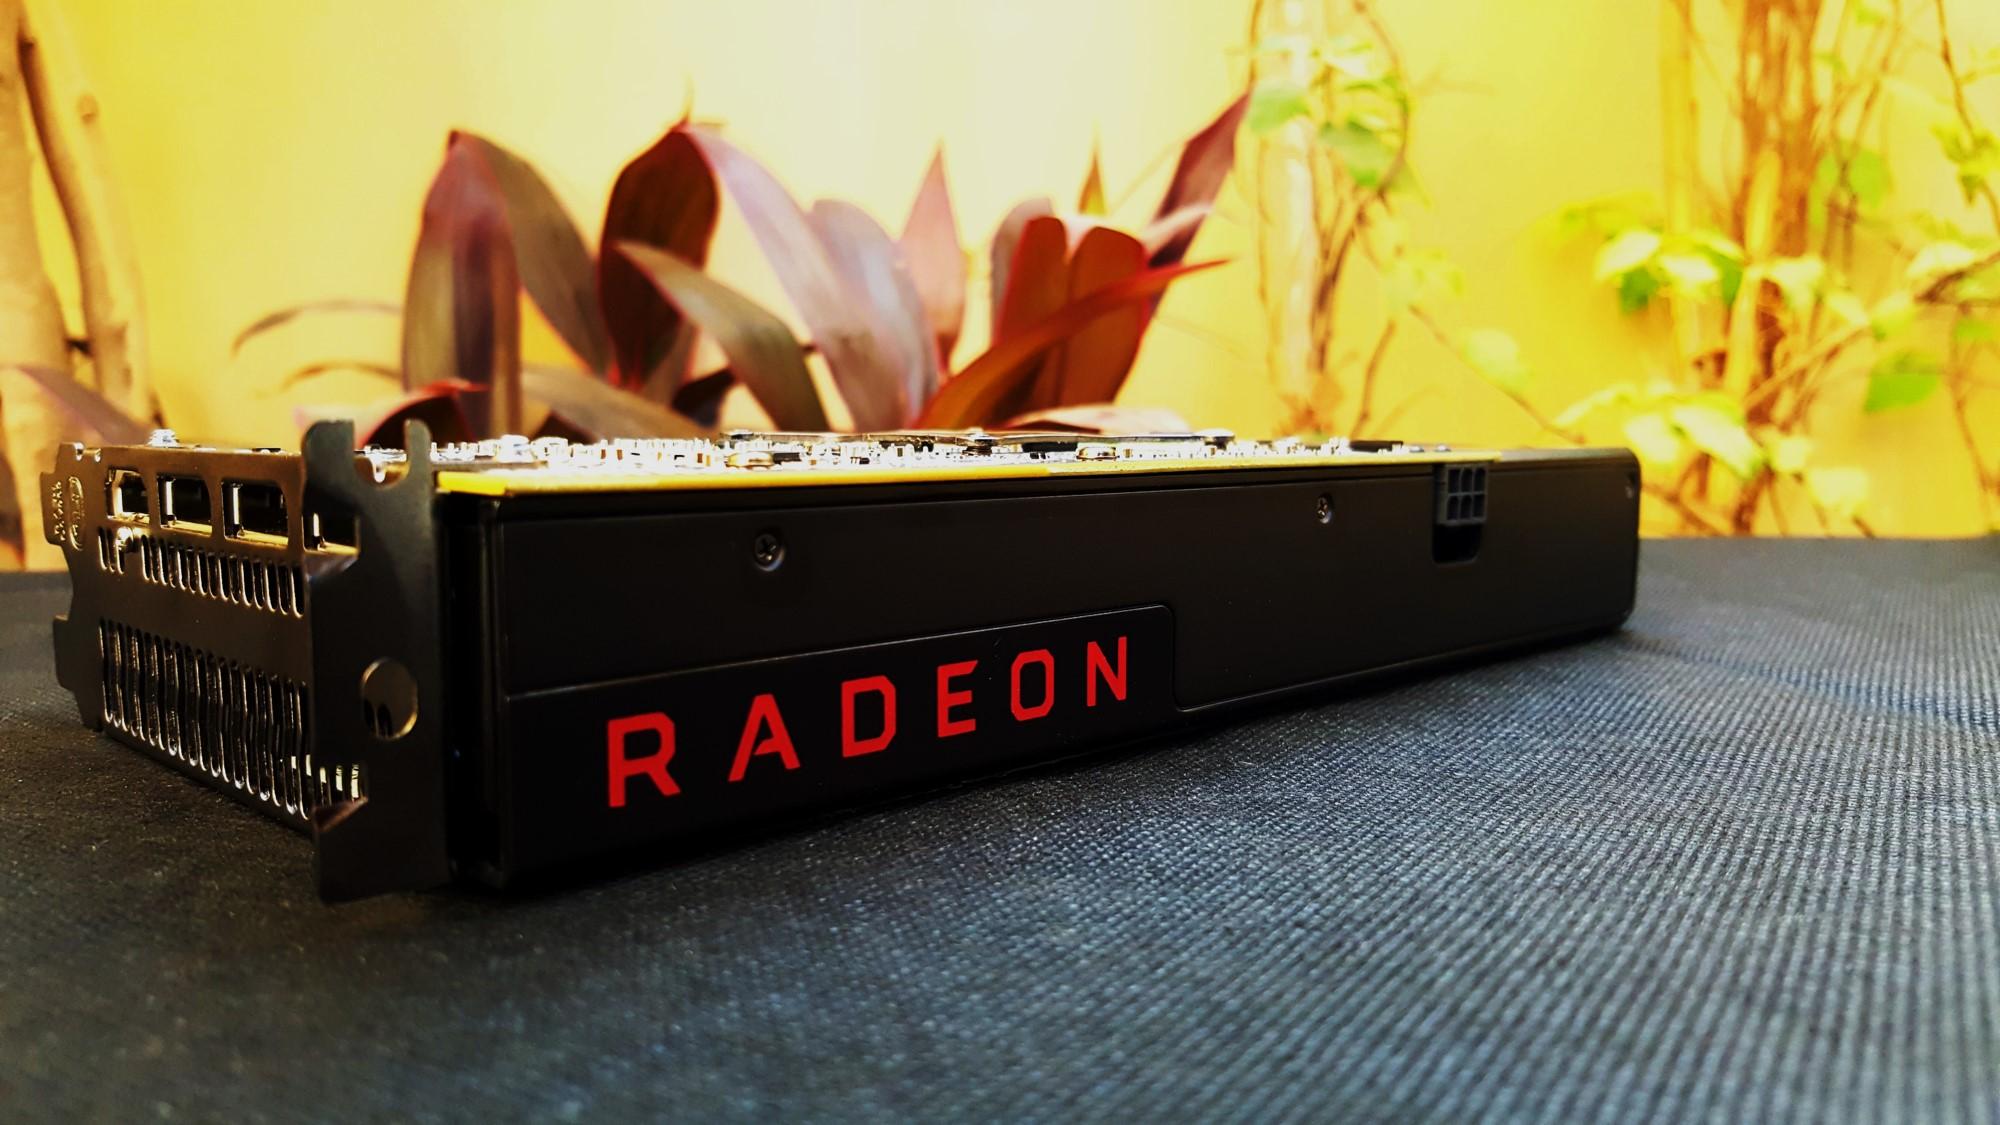 6-AMD Radeon RX 480